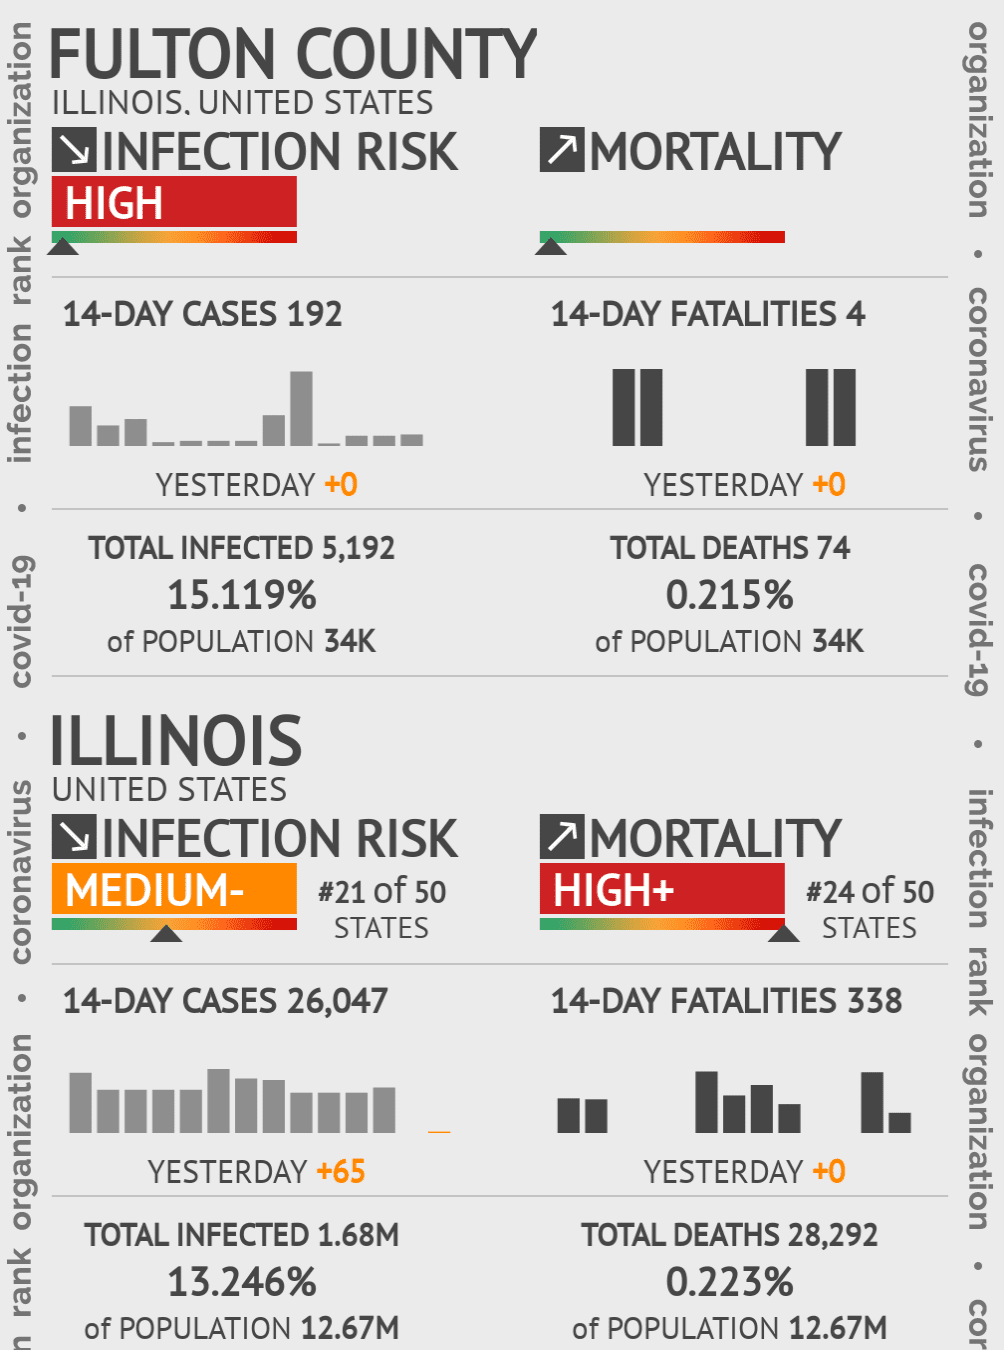 Fulton County Coronavirus Covid-19 Risk of Infection on July 24, 2021